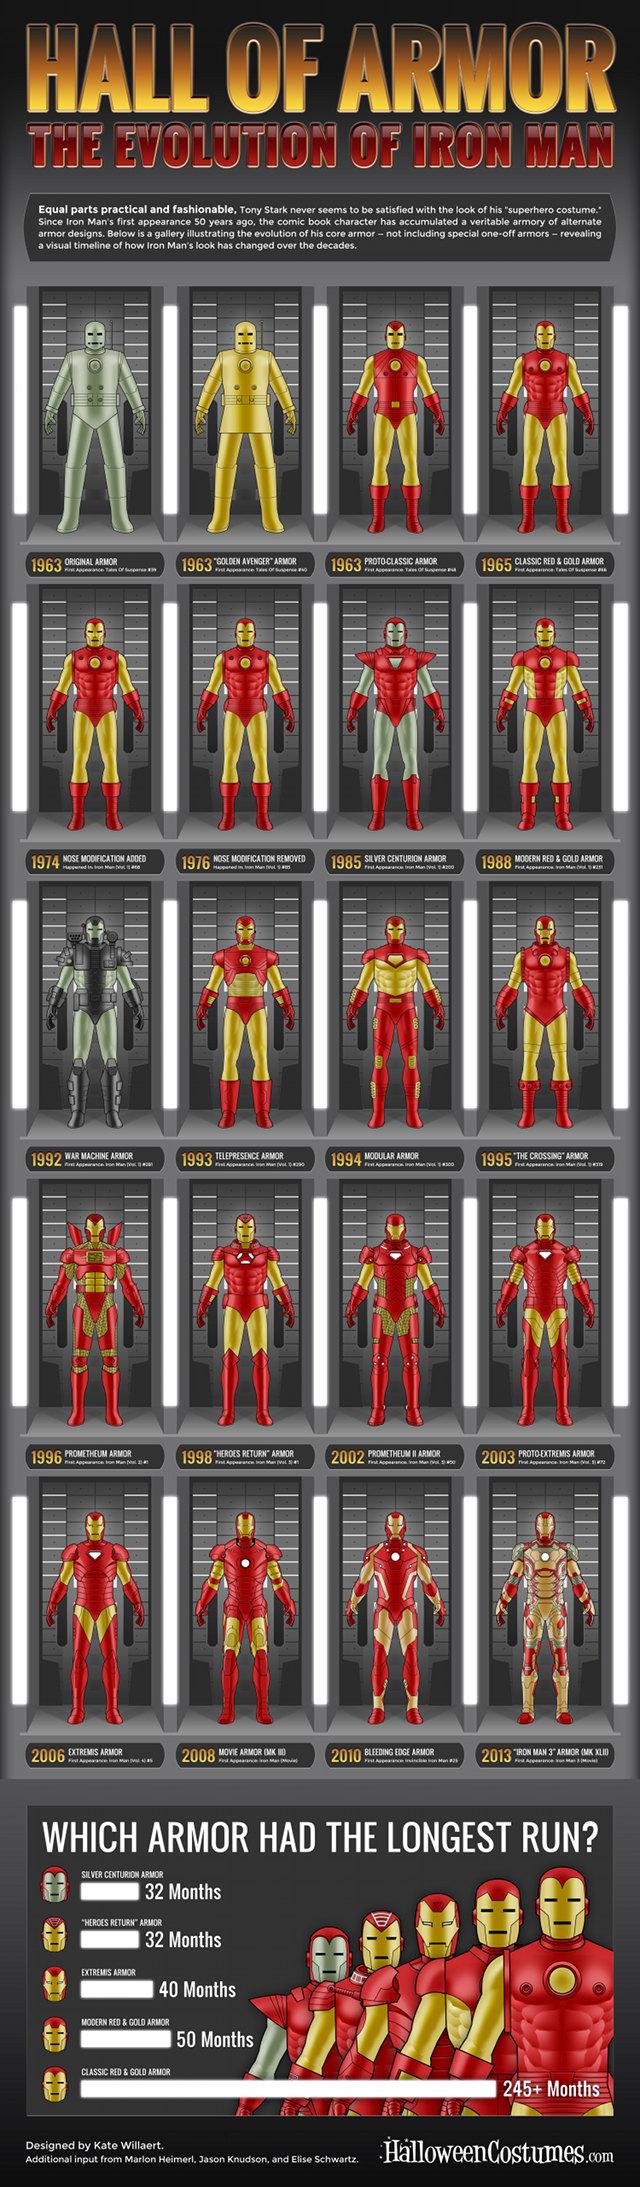 iron-man-armor-evolution-small